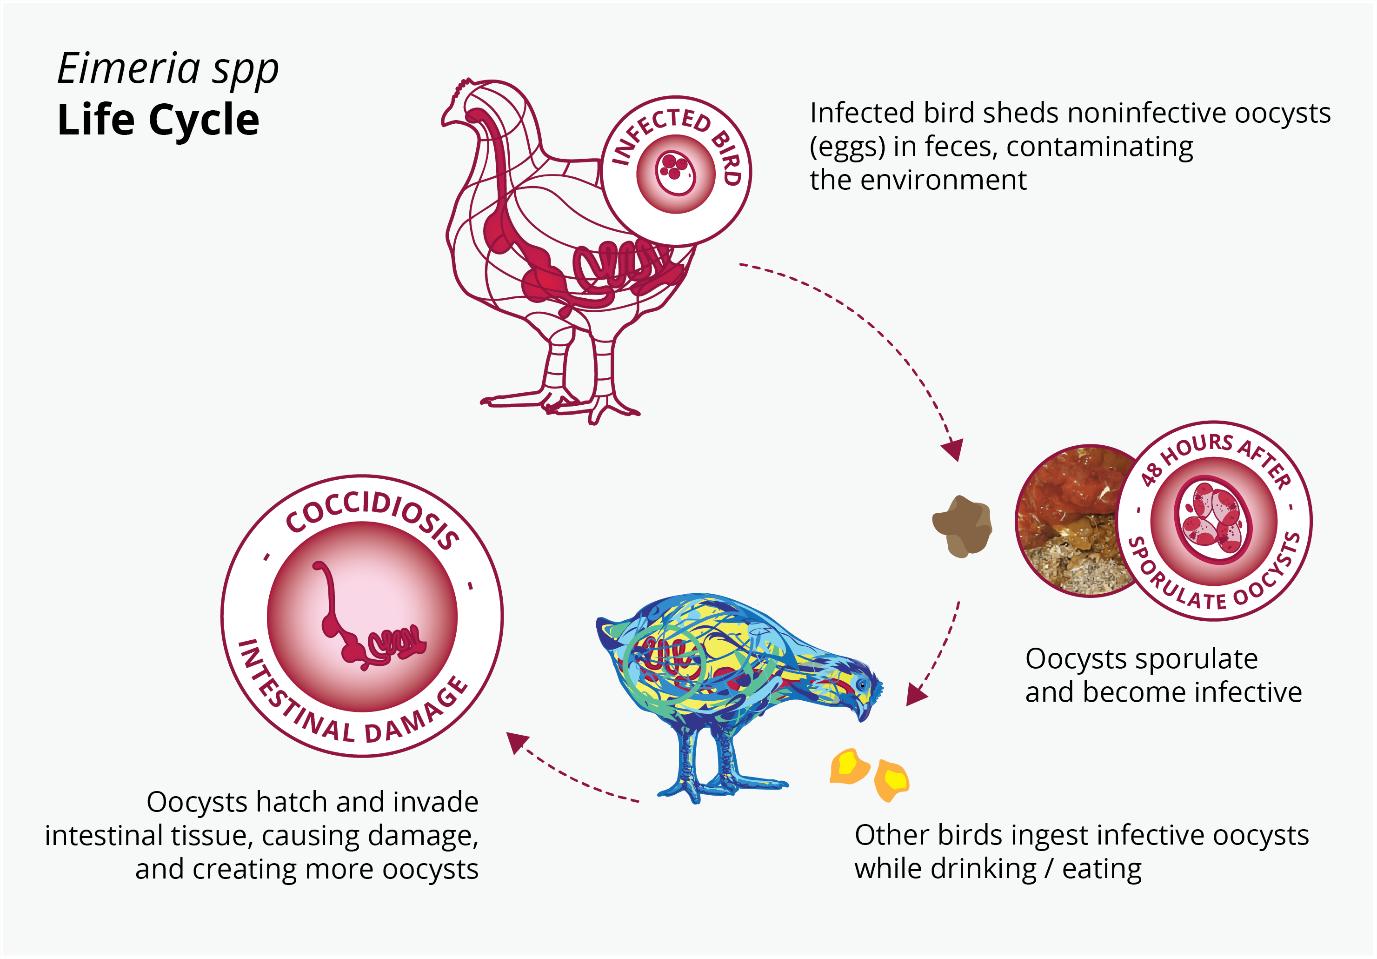 Figure 3: Eimeria spp. life cycle